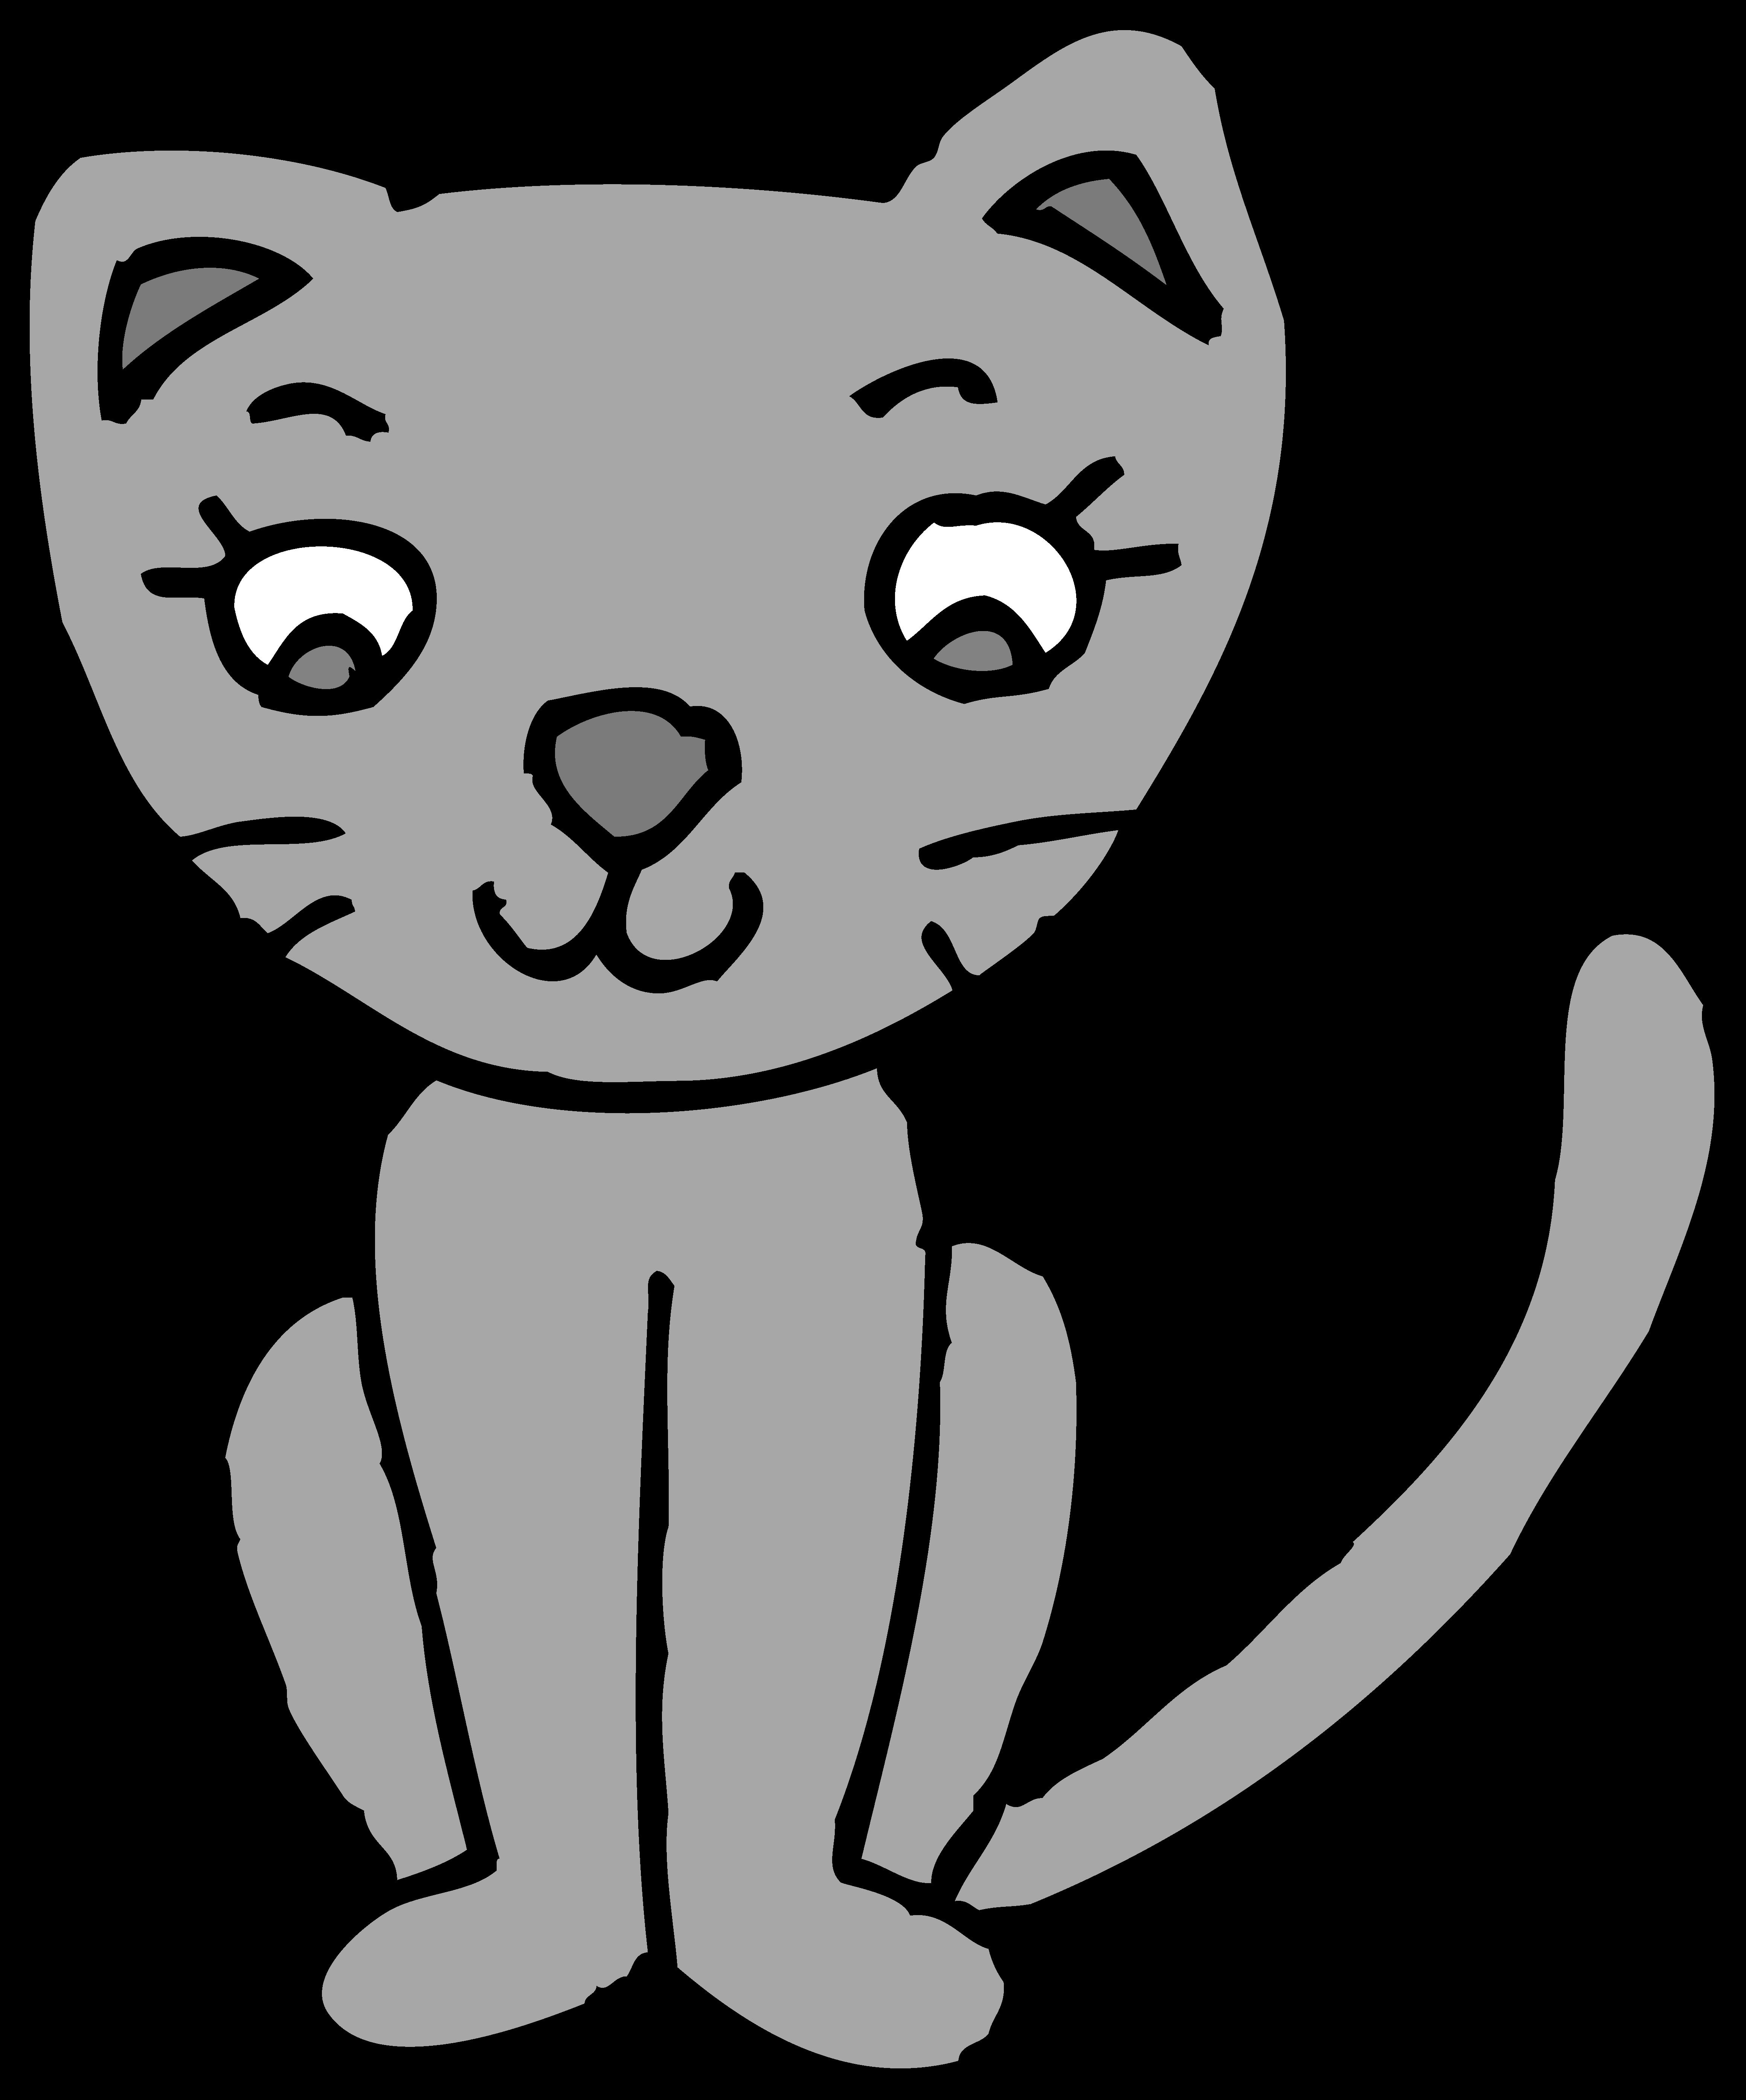 Cute cat clipart free clip art library download Cute Cat Clipart - Page 3 of 5 - ClipartBlack.com clip art library download